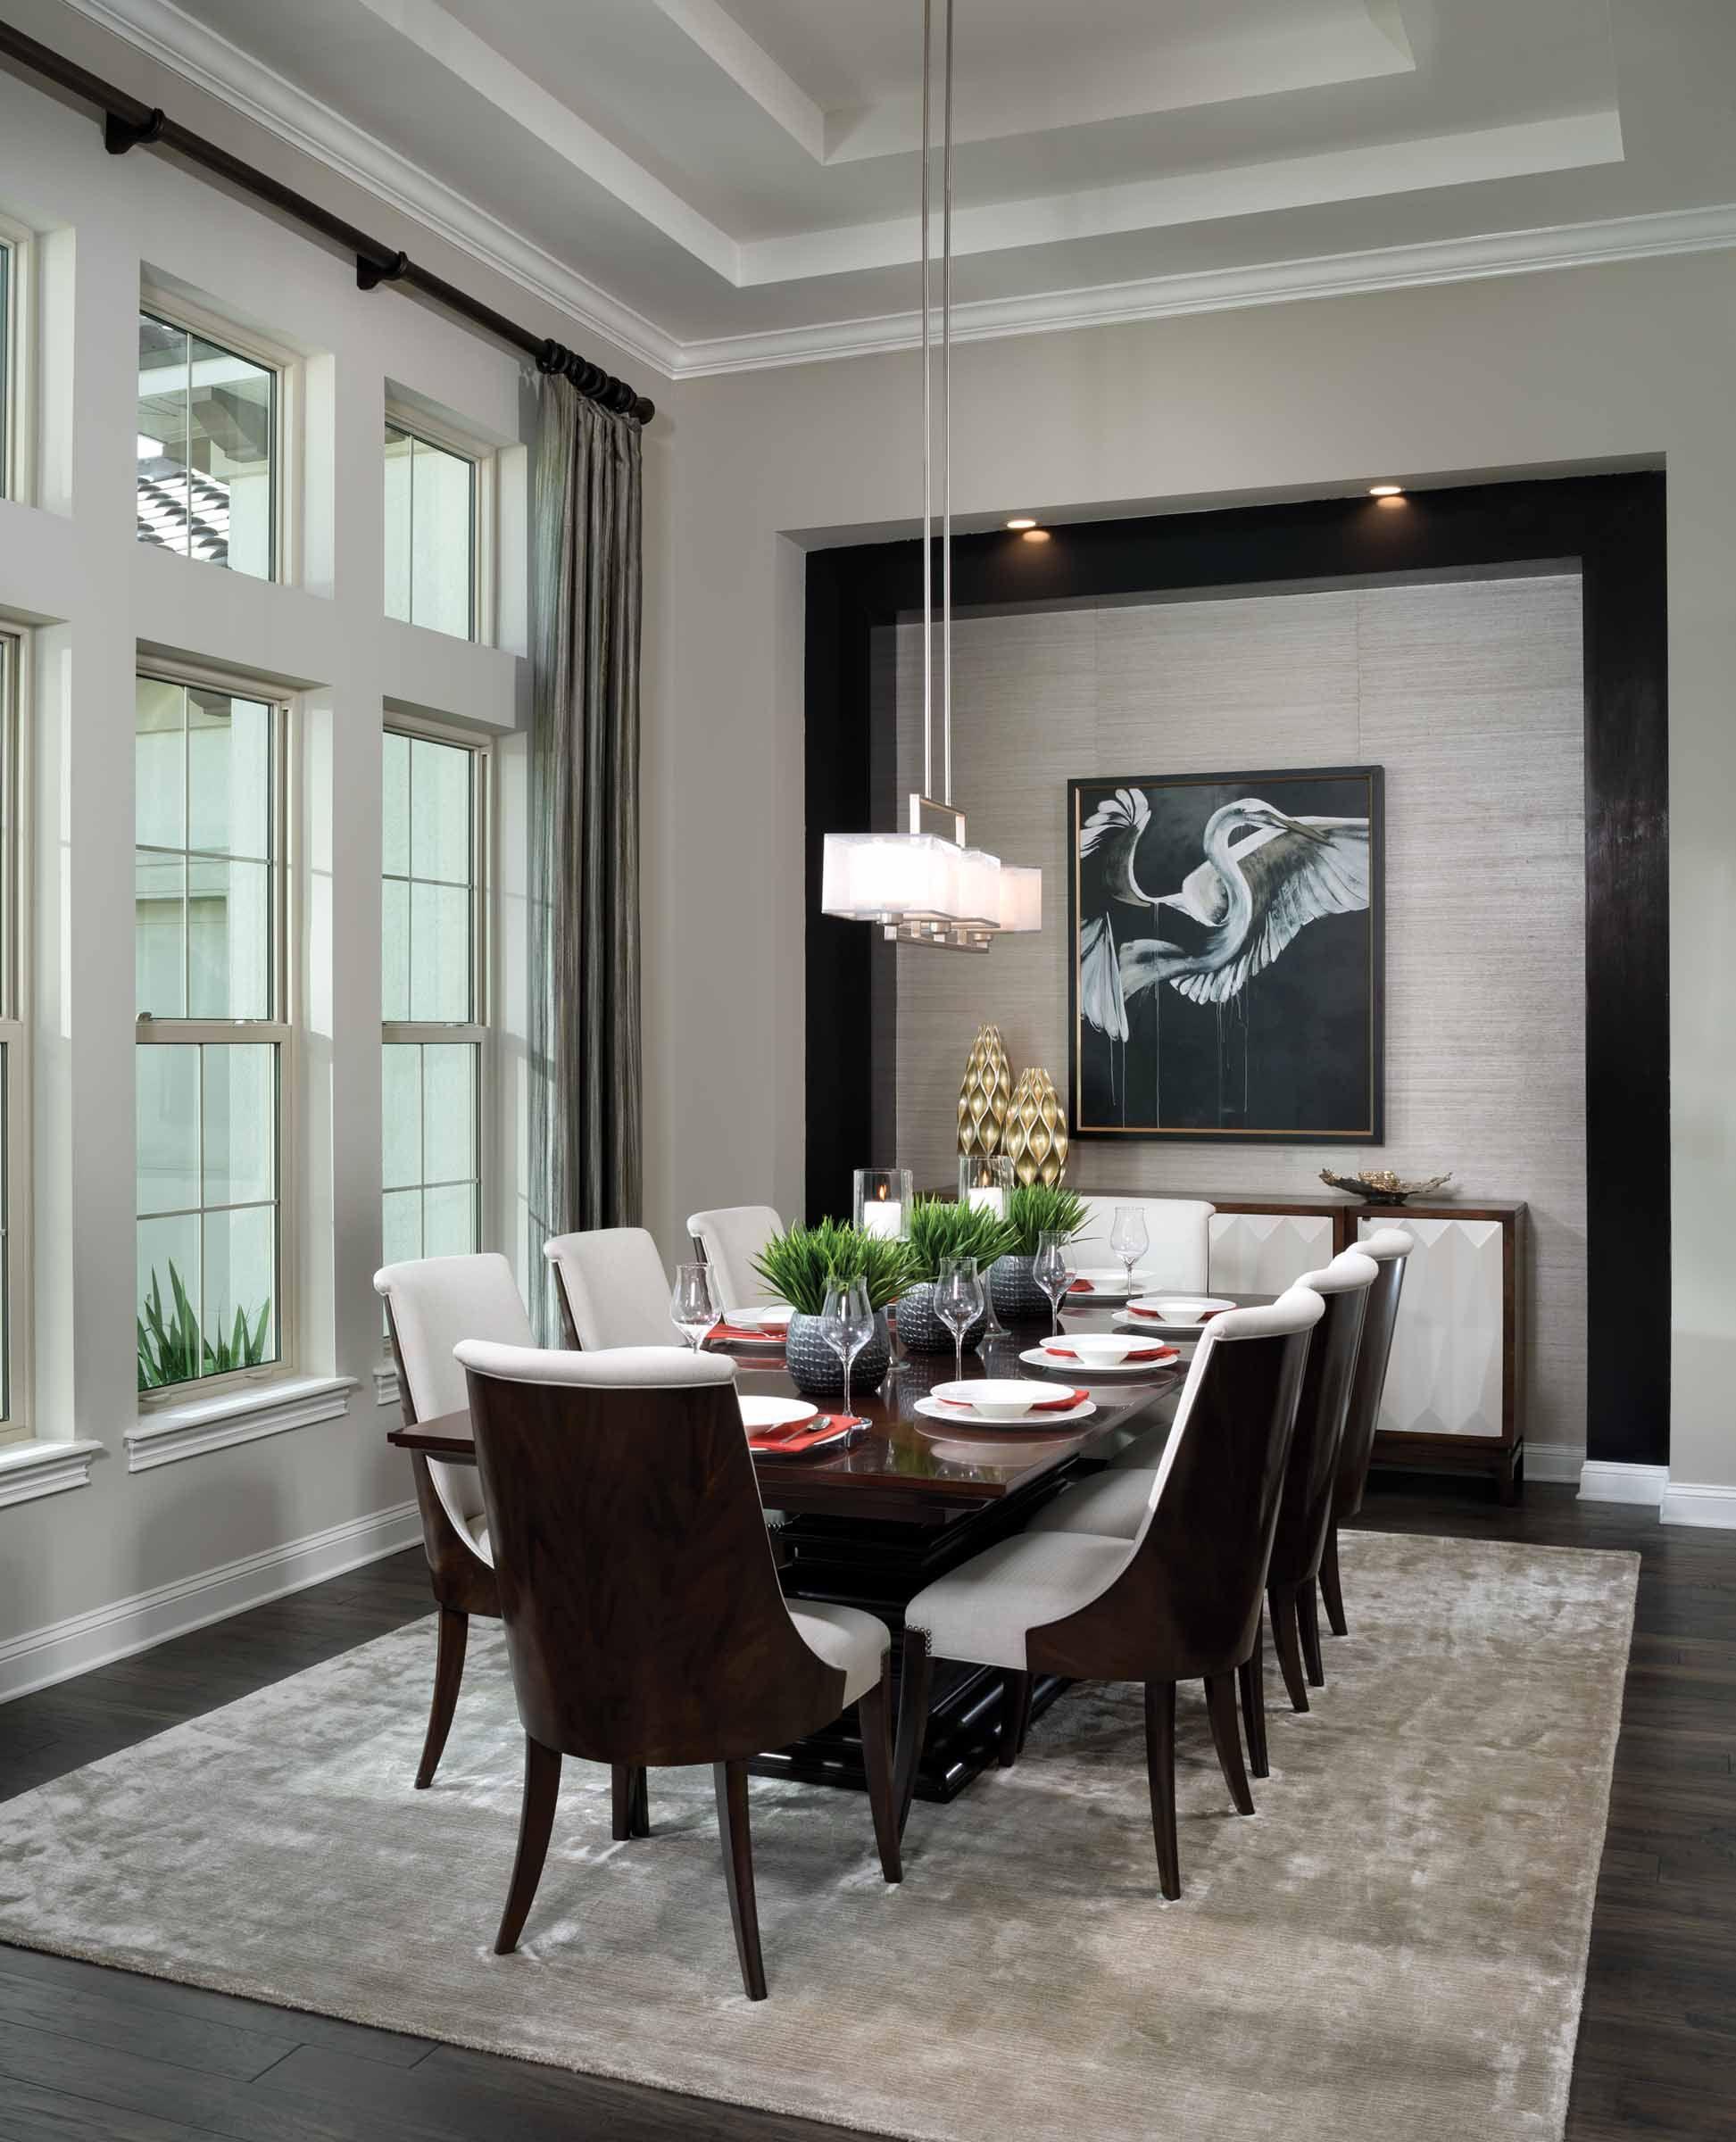 35 Luxury Dining Room Design Ideas: Luxury Dining Room, Luxury Dining